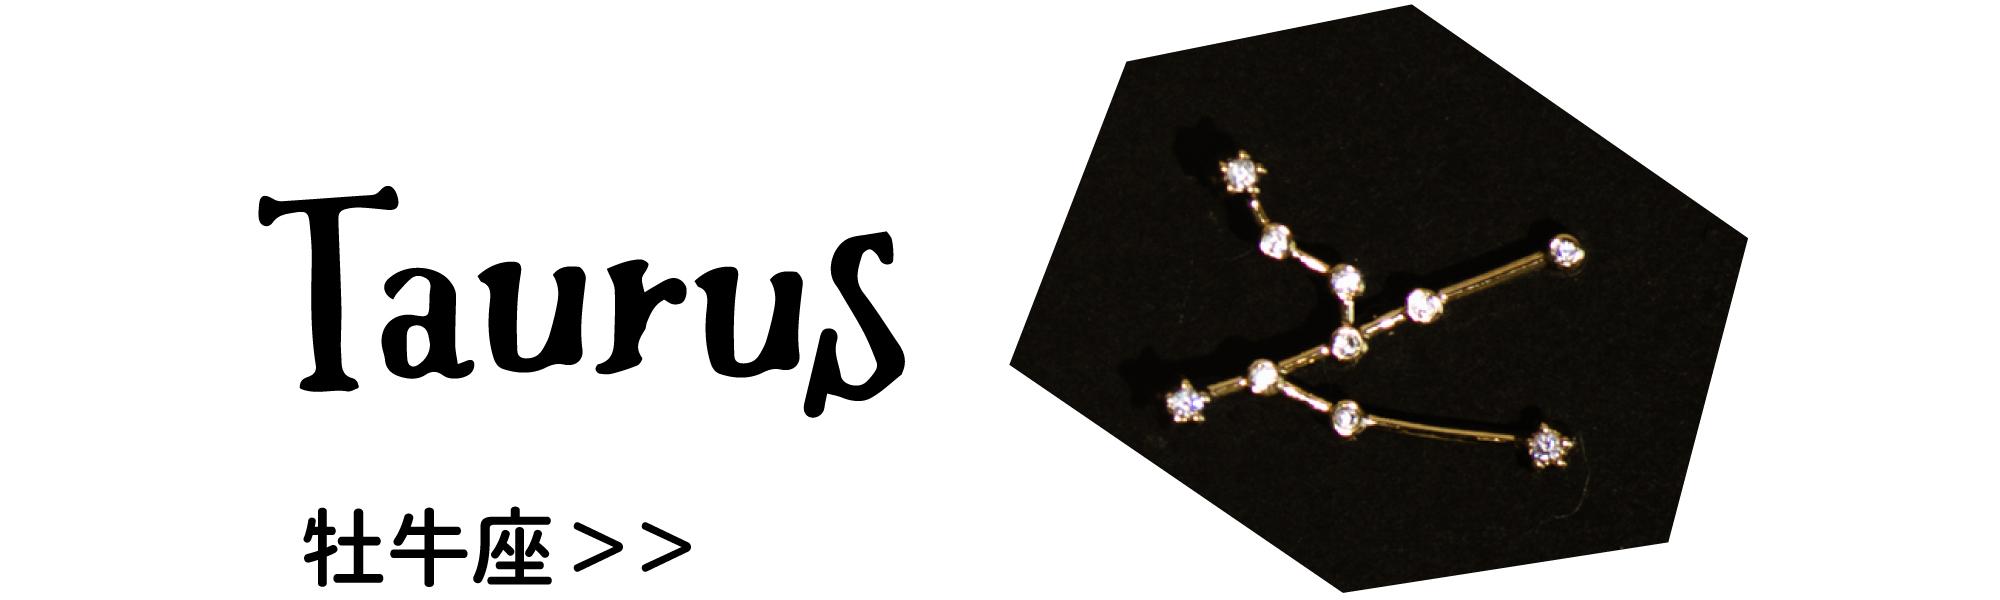 2_Taurus